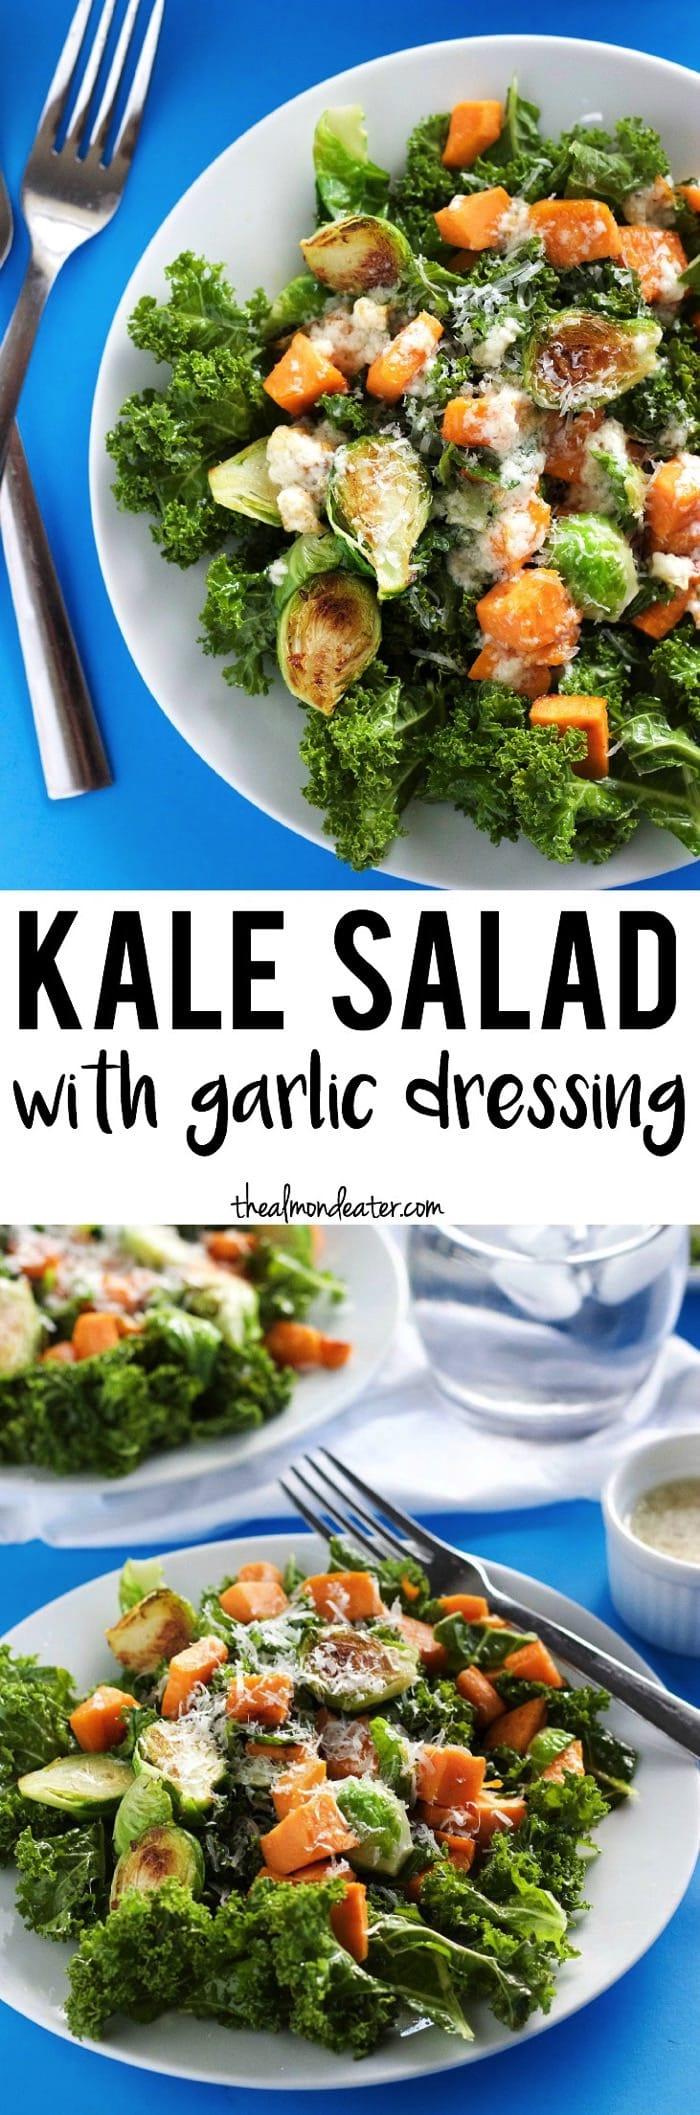 Kale Salad with Garlic Dressing